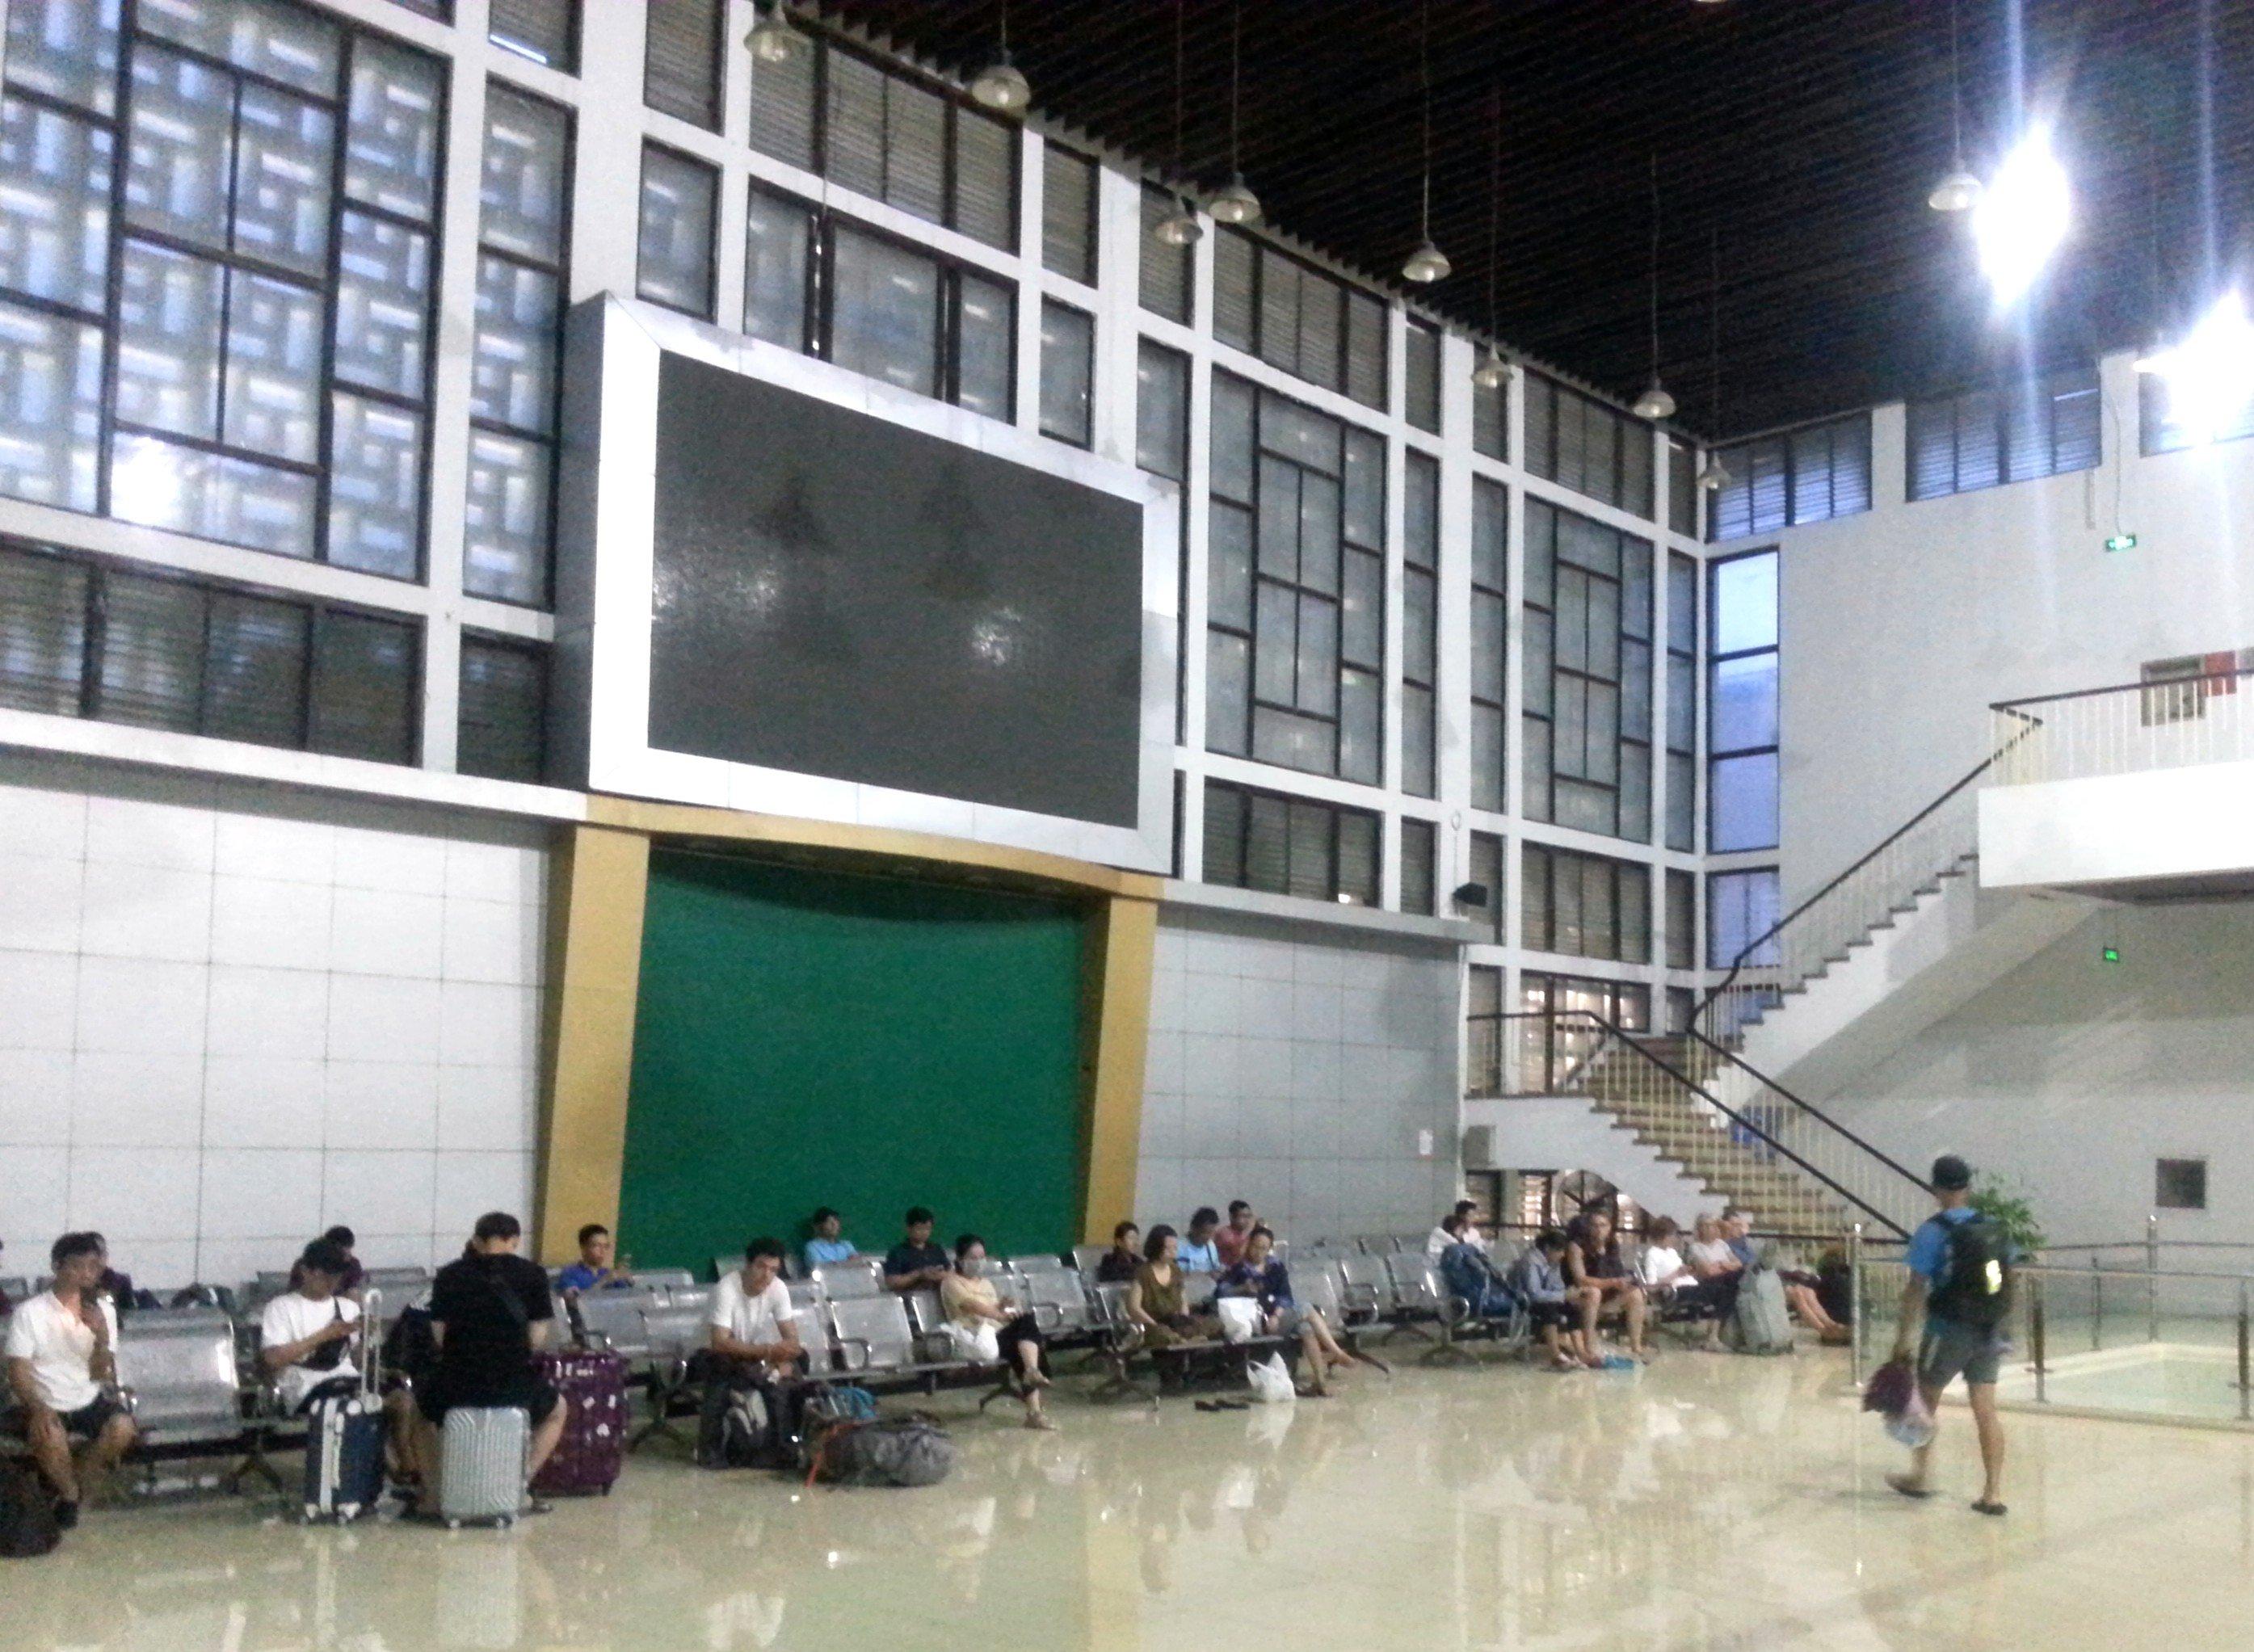 Upstairs waiting area at Hanoi Railway Station